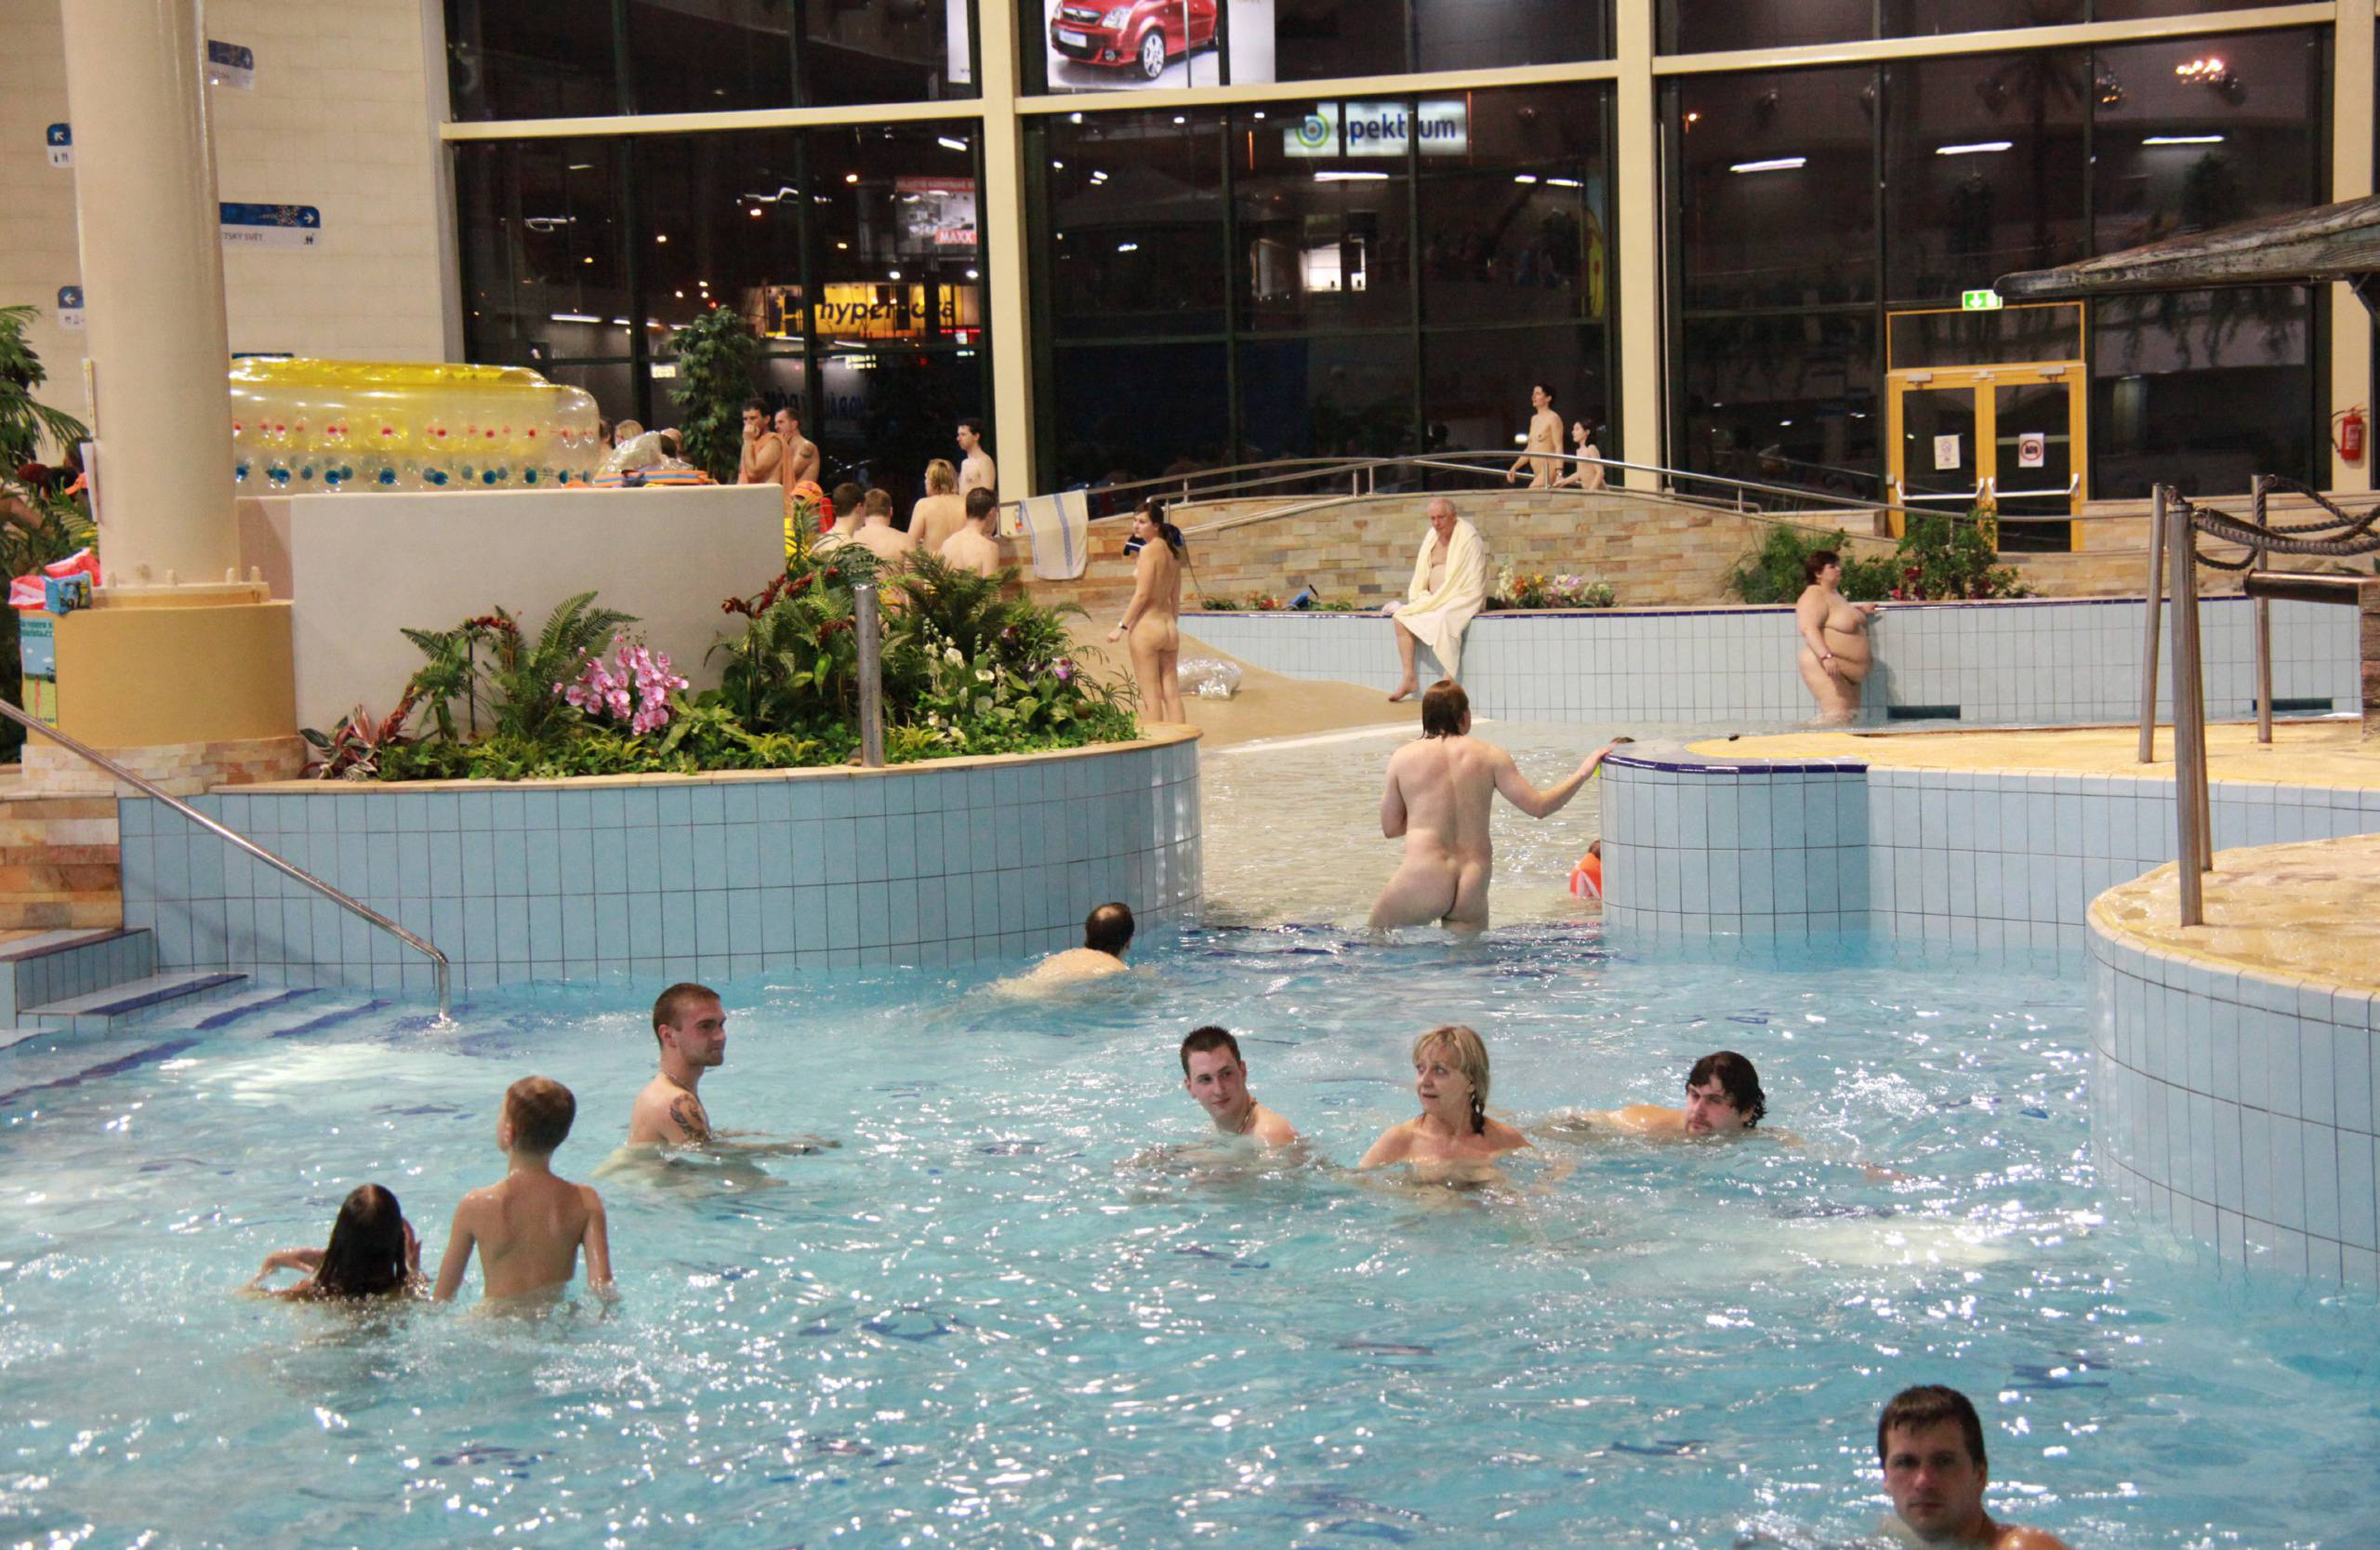 Pool Day Celebration Part - 1